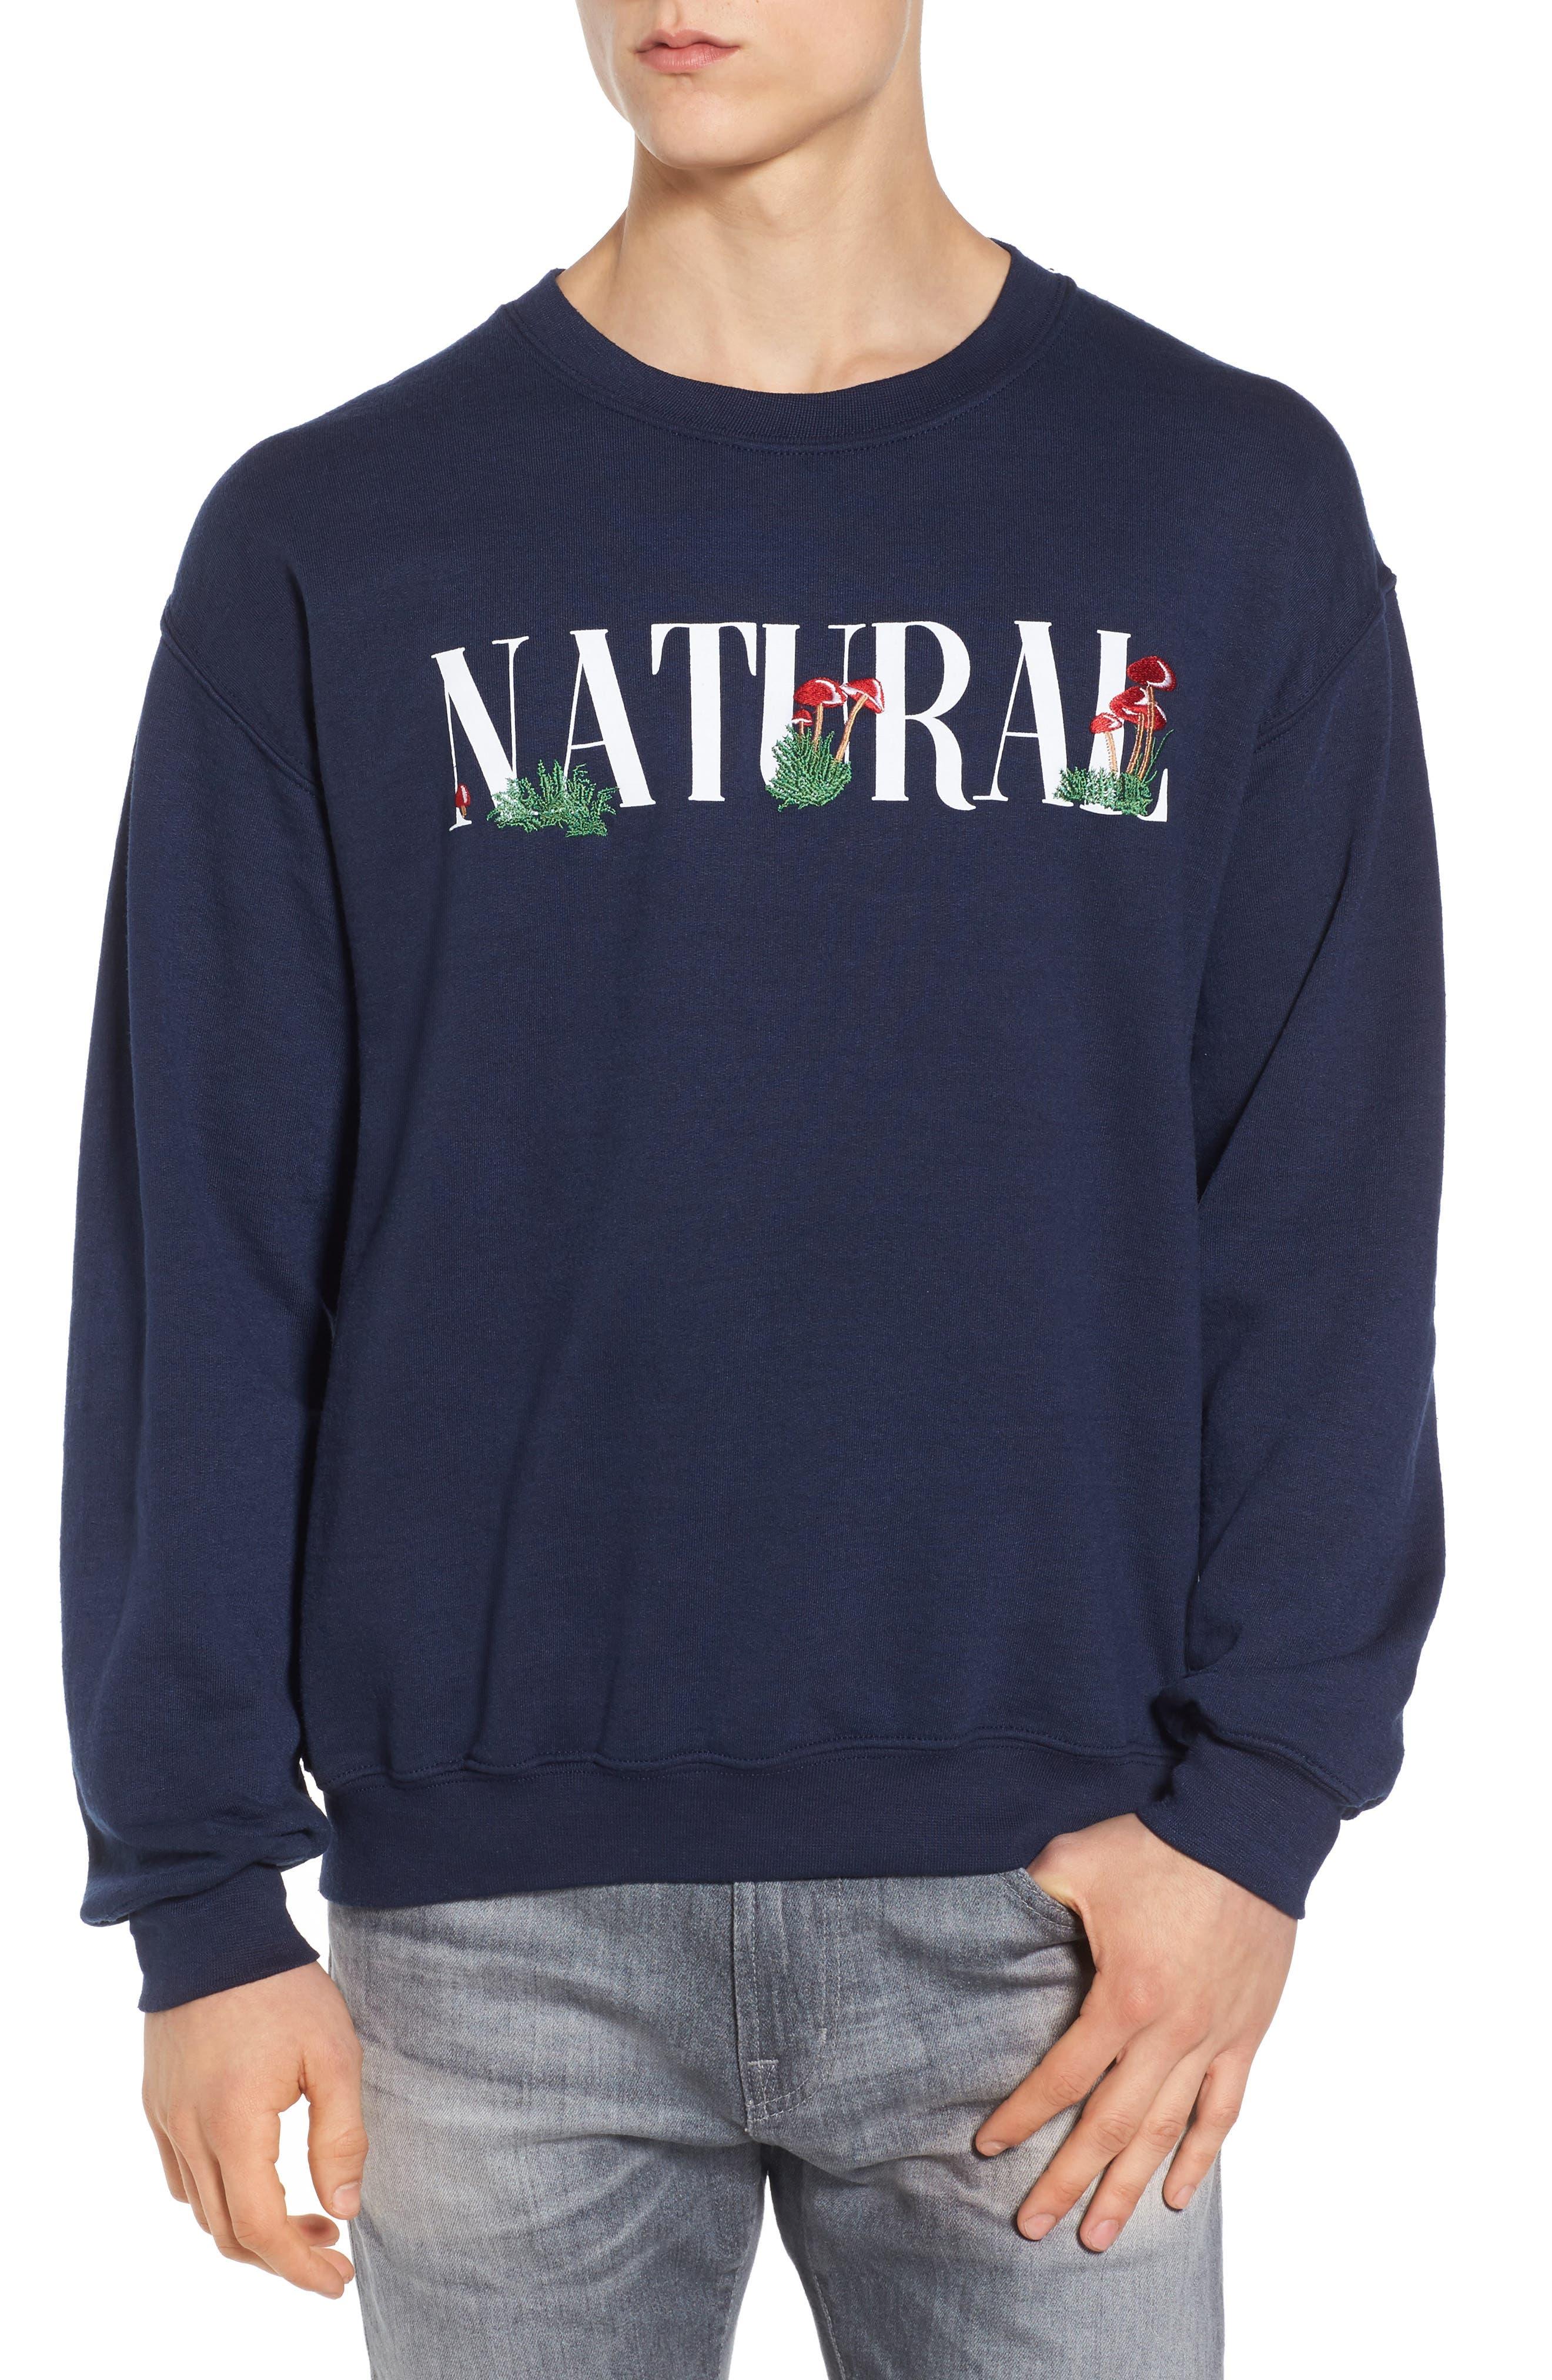 Natural Mushroom Sweatshirt,                         Main,                         color, Blue